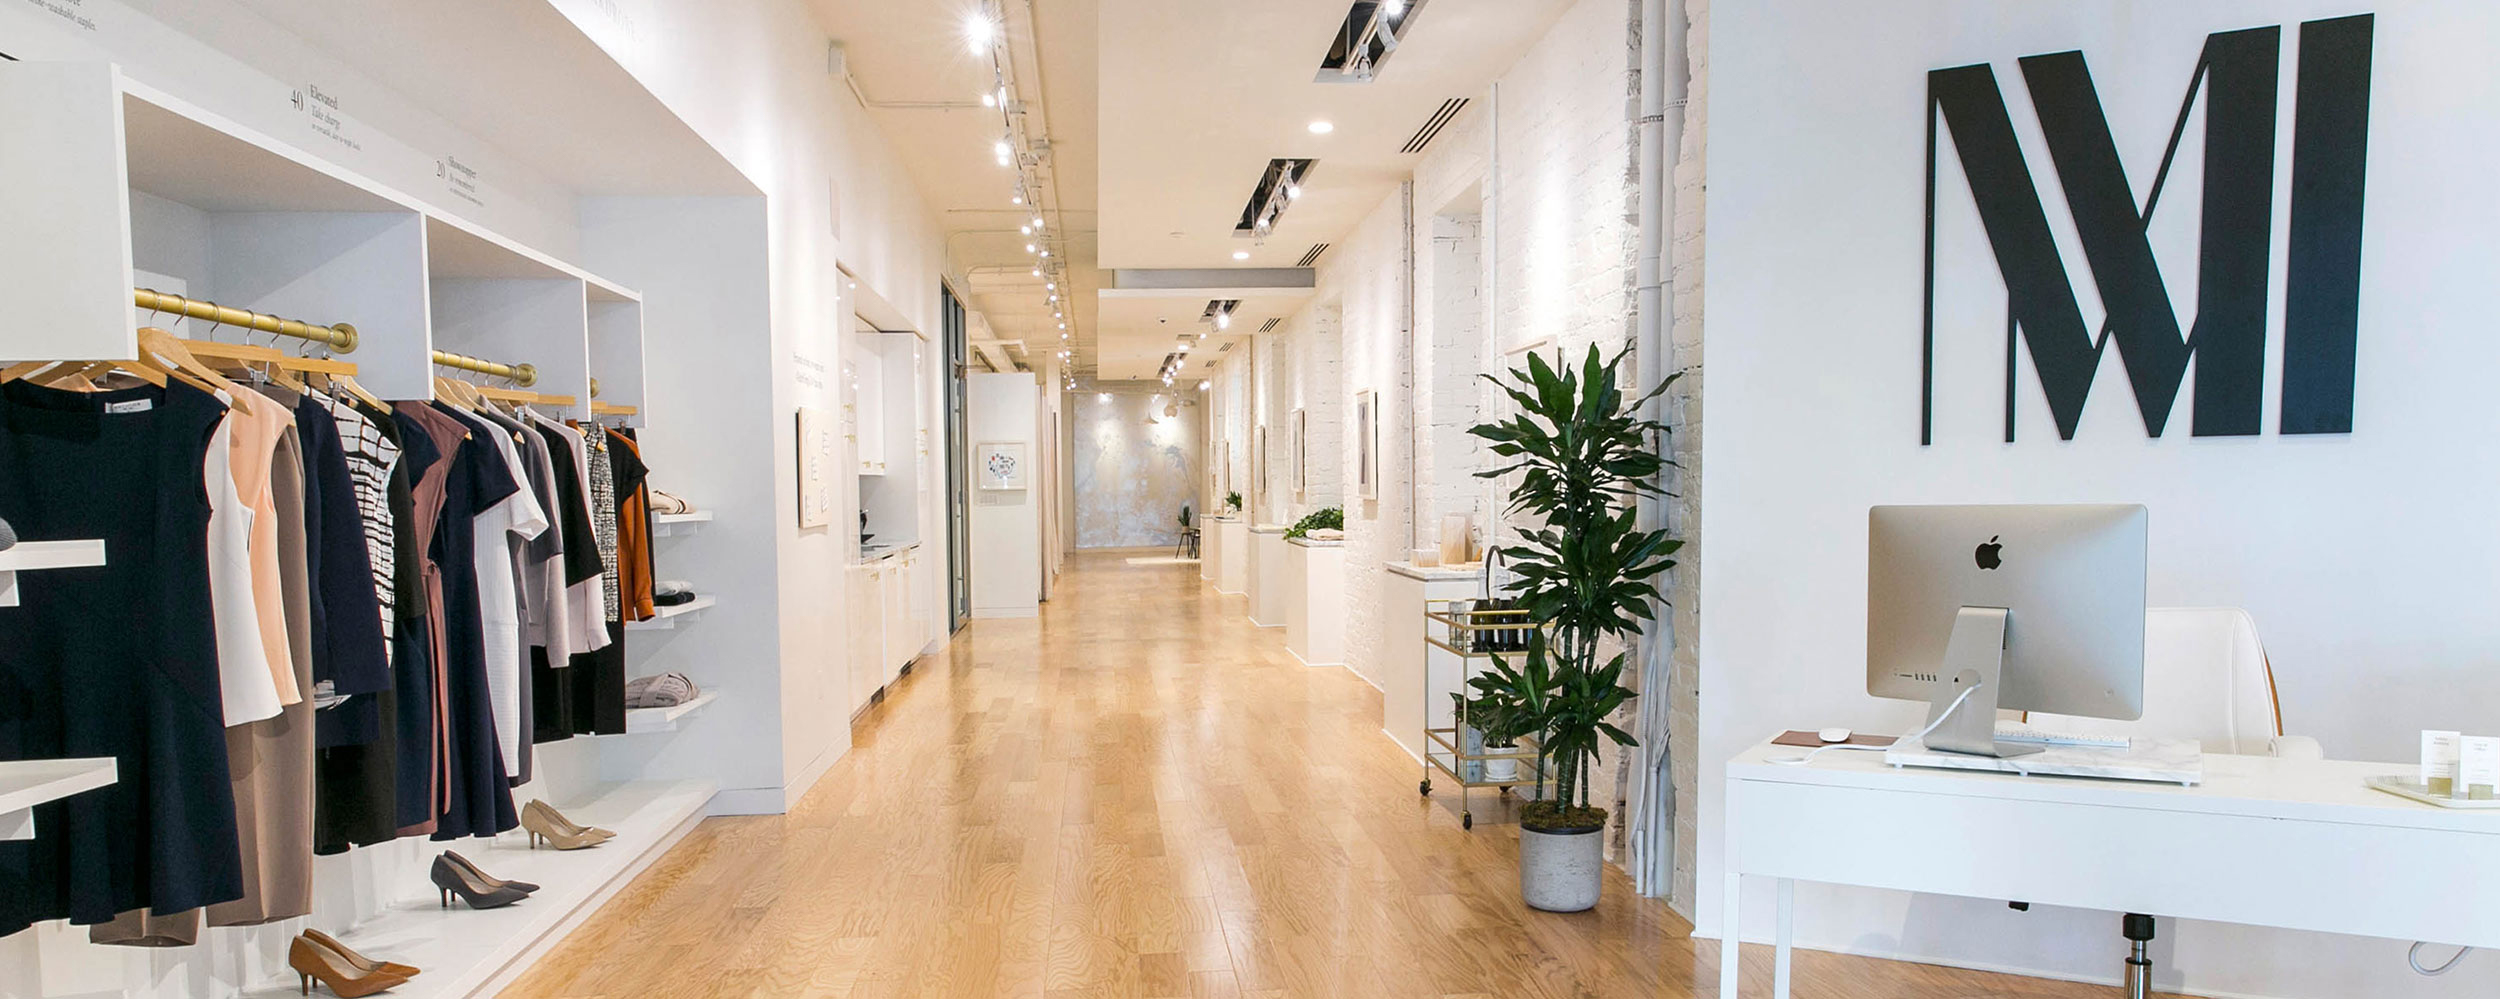 MM LaFleur luxury showroom Future of online luxury retail - Luxe Digital